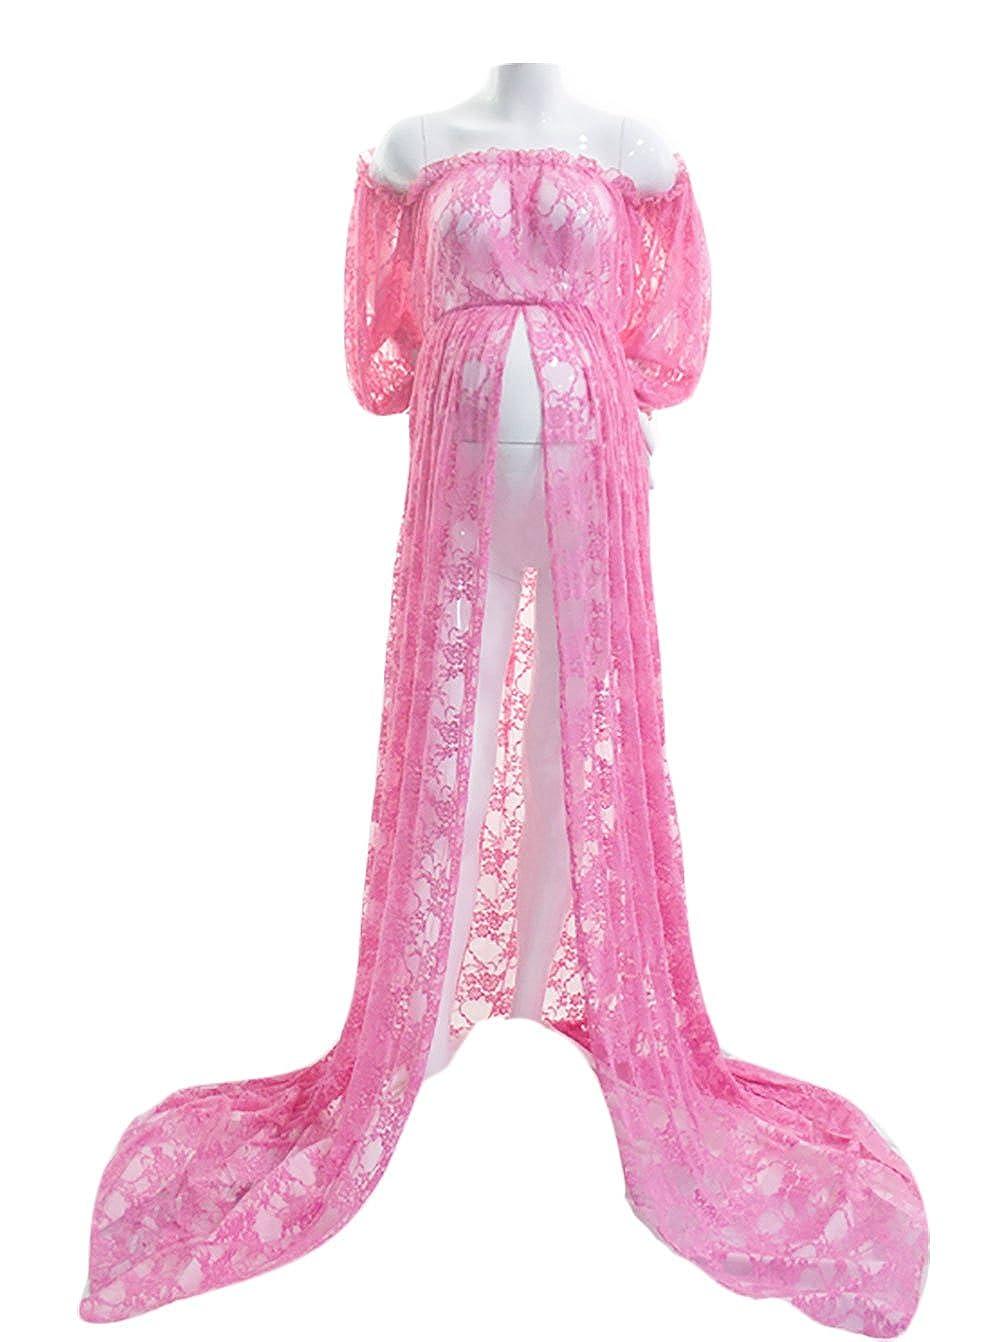 Hopeverl DRESS レディース Hopeverl レディース B076HQJCKZ ピンク ピンク One Size, チヨダマチ:eff80bf7 --- bhaipremfoundation.org